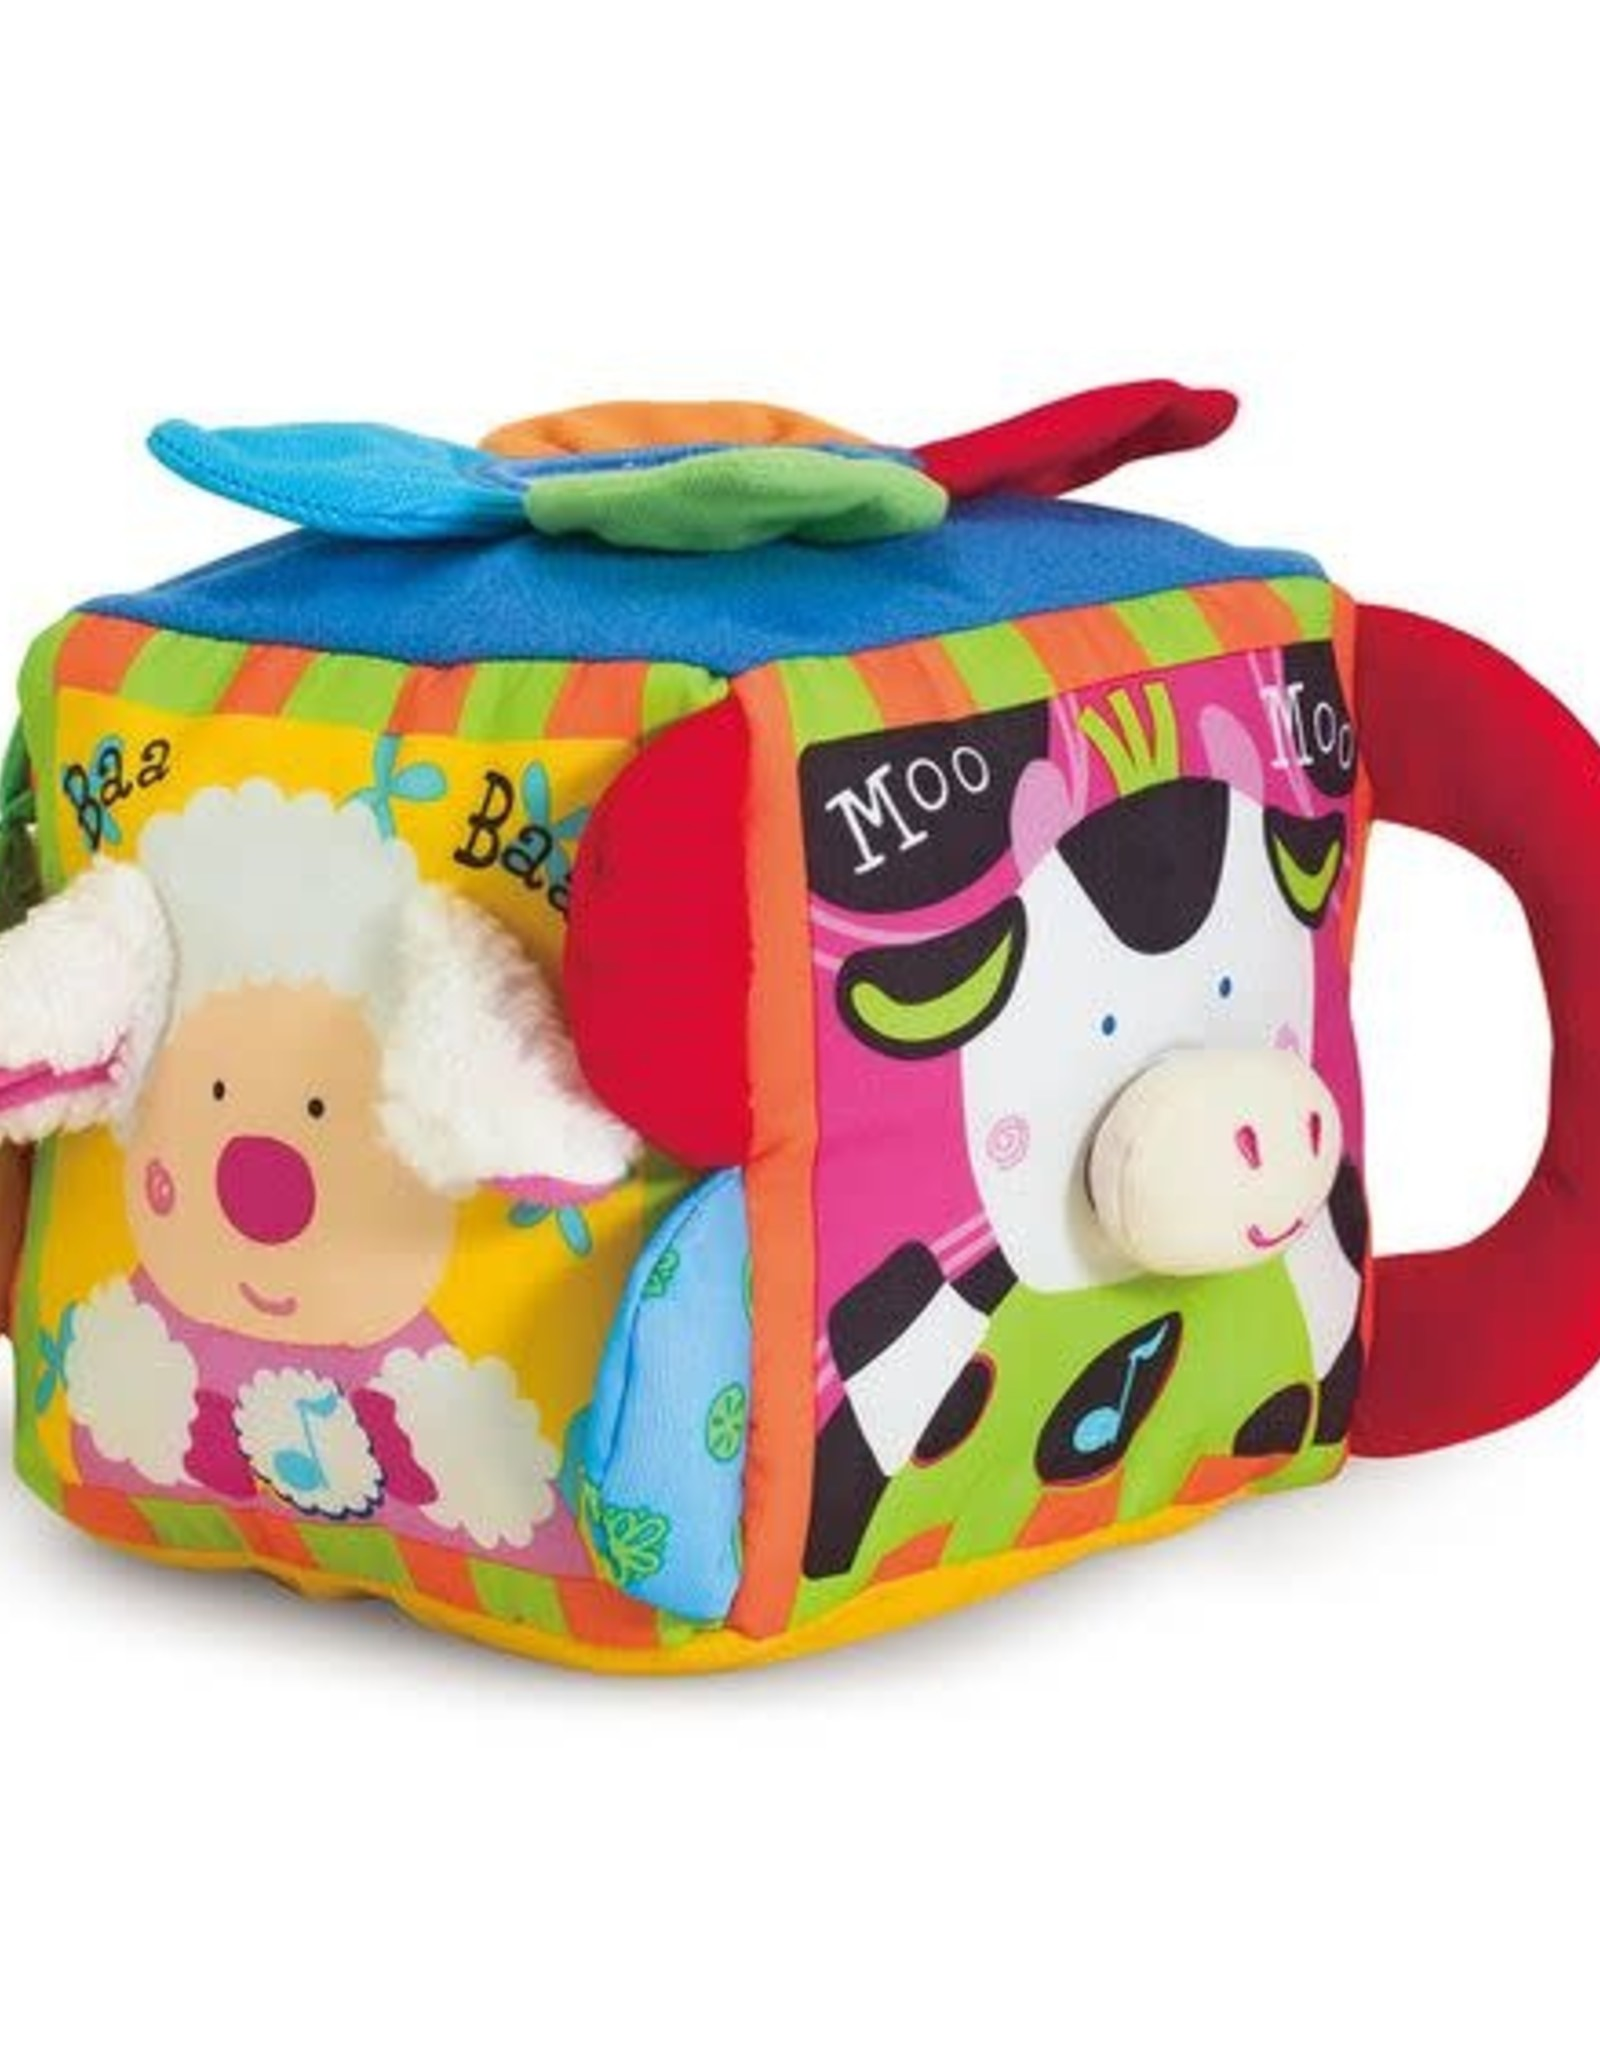 Melissa & Doug Melissa & Doug Musical Farmyard Cube